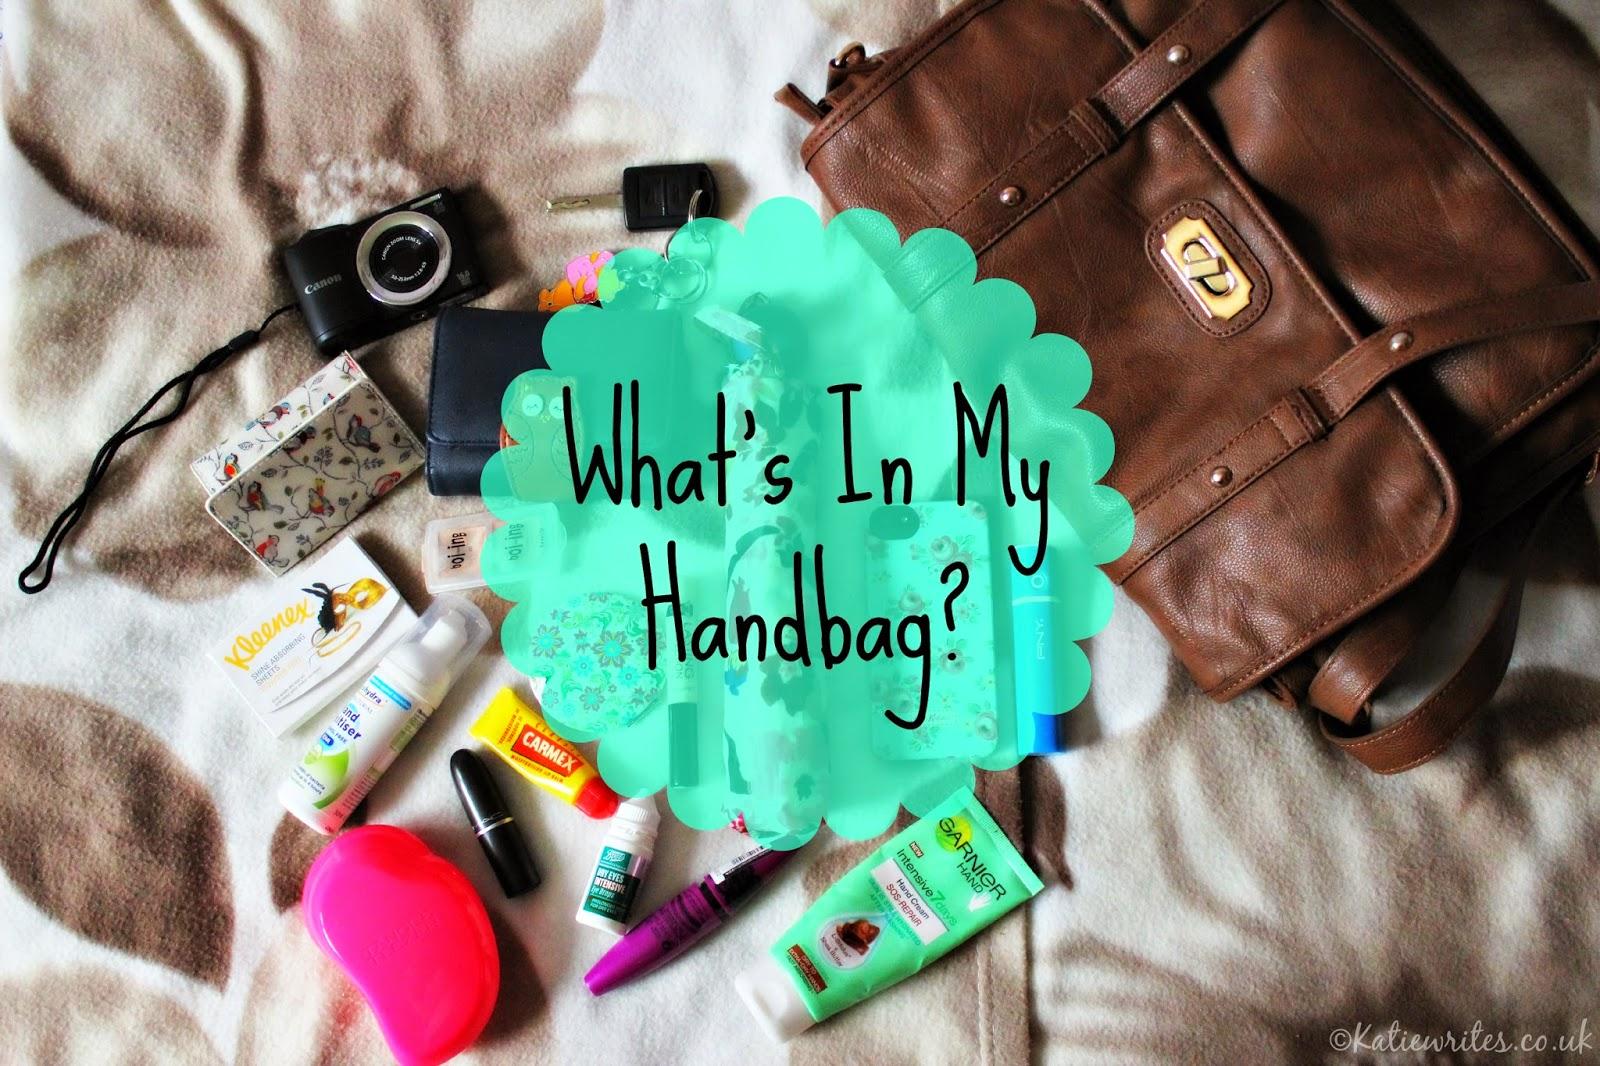 What's In My Handbag?